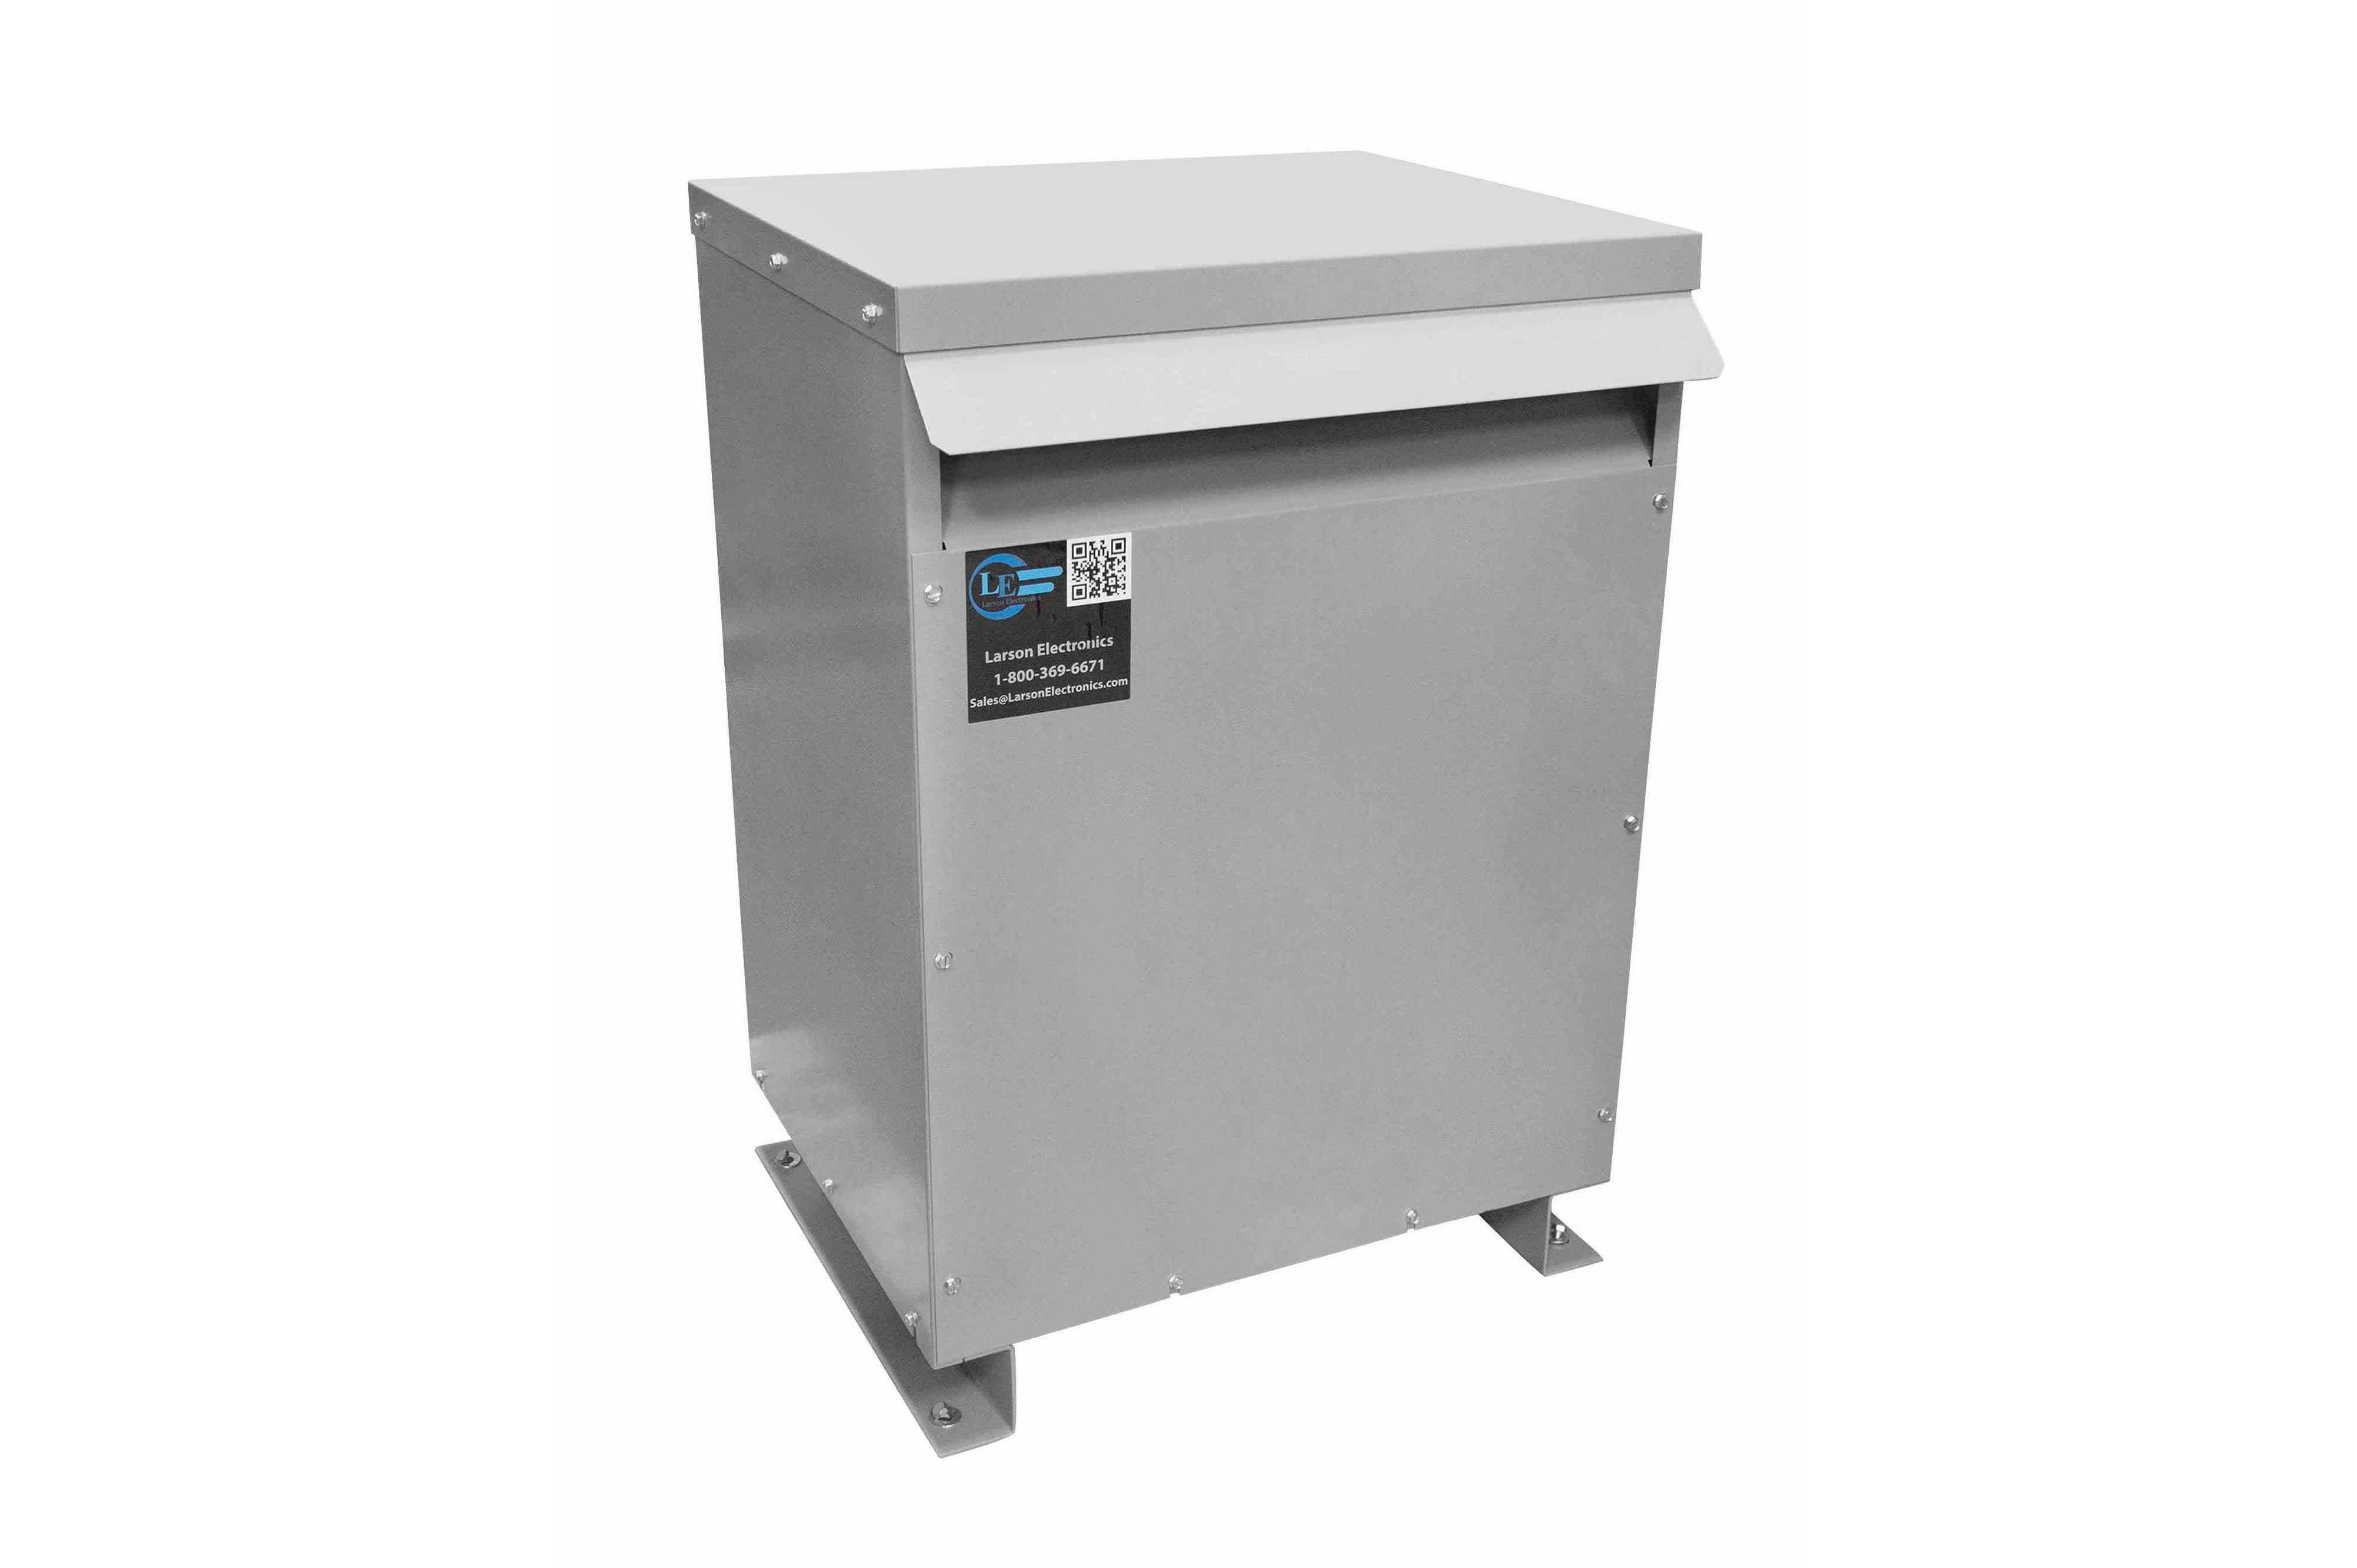 1000 kVA 3PH Isolation Transformer, 380V Wye Primary, 480V Delta Secondary, N3R, Ventilated, 60 Hz